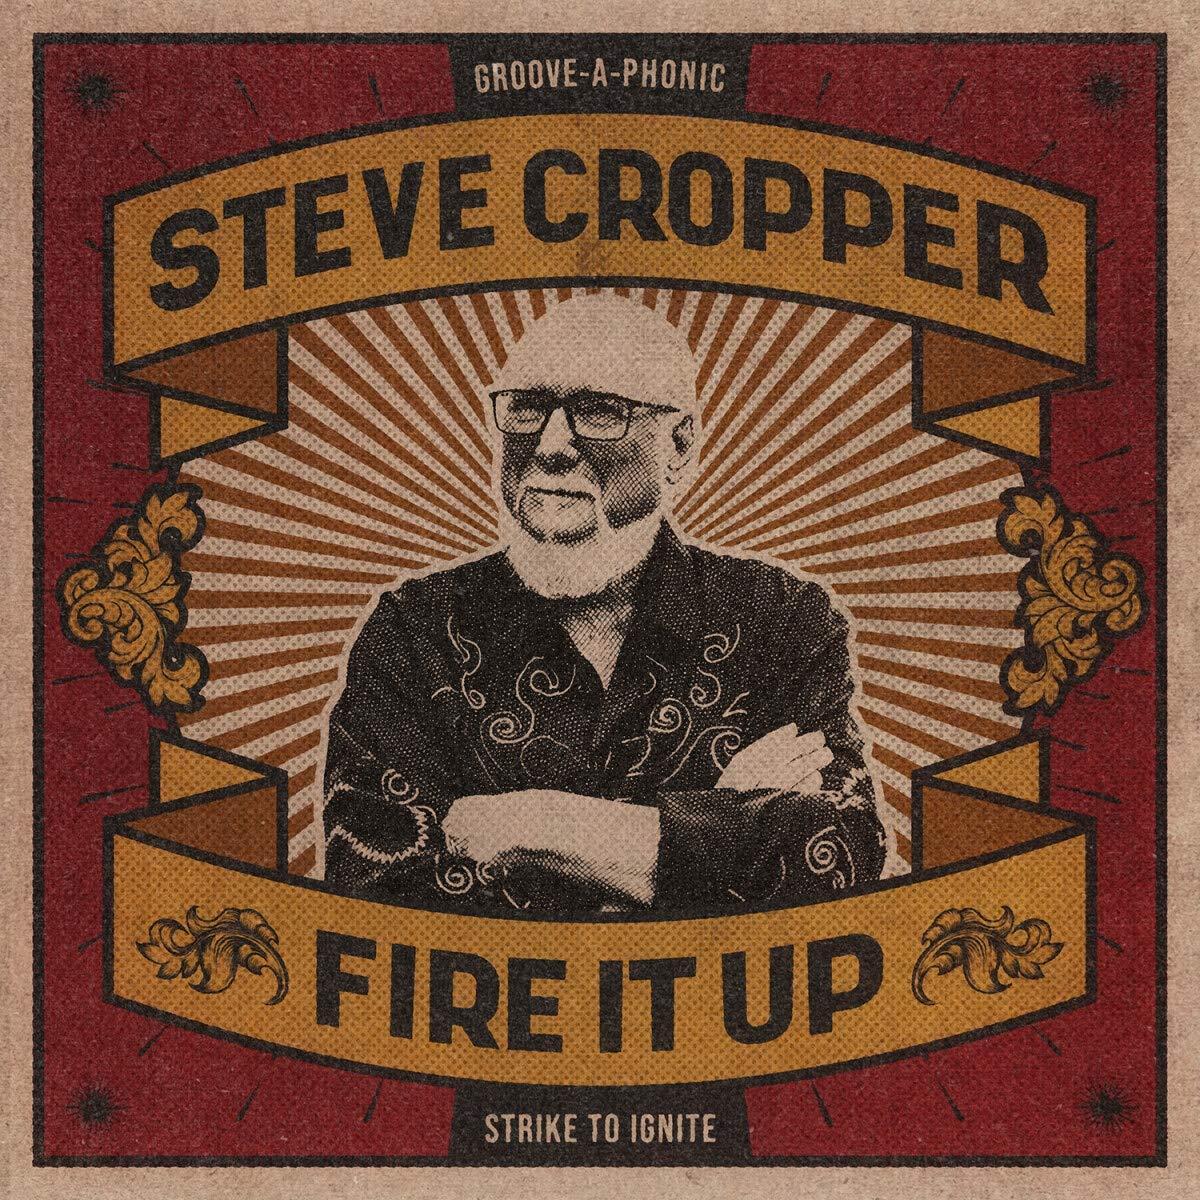 Steve Cropper - Fire It Up (2021) [FLAC] Download